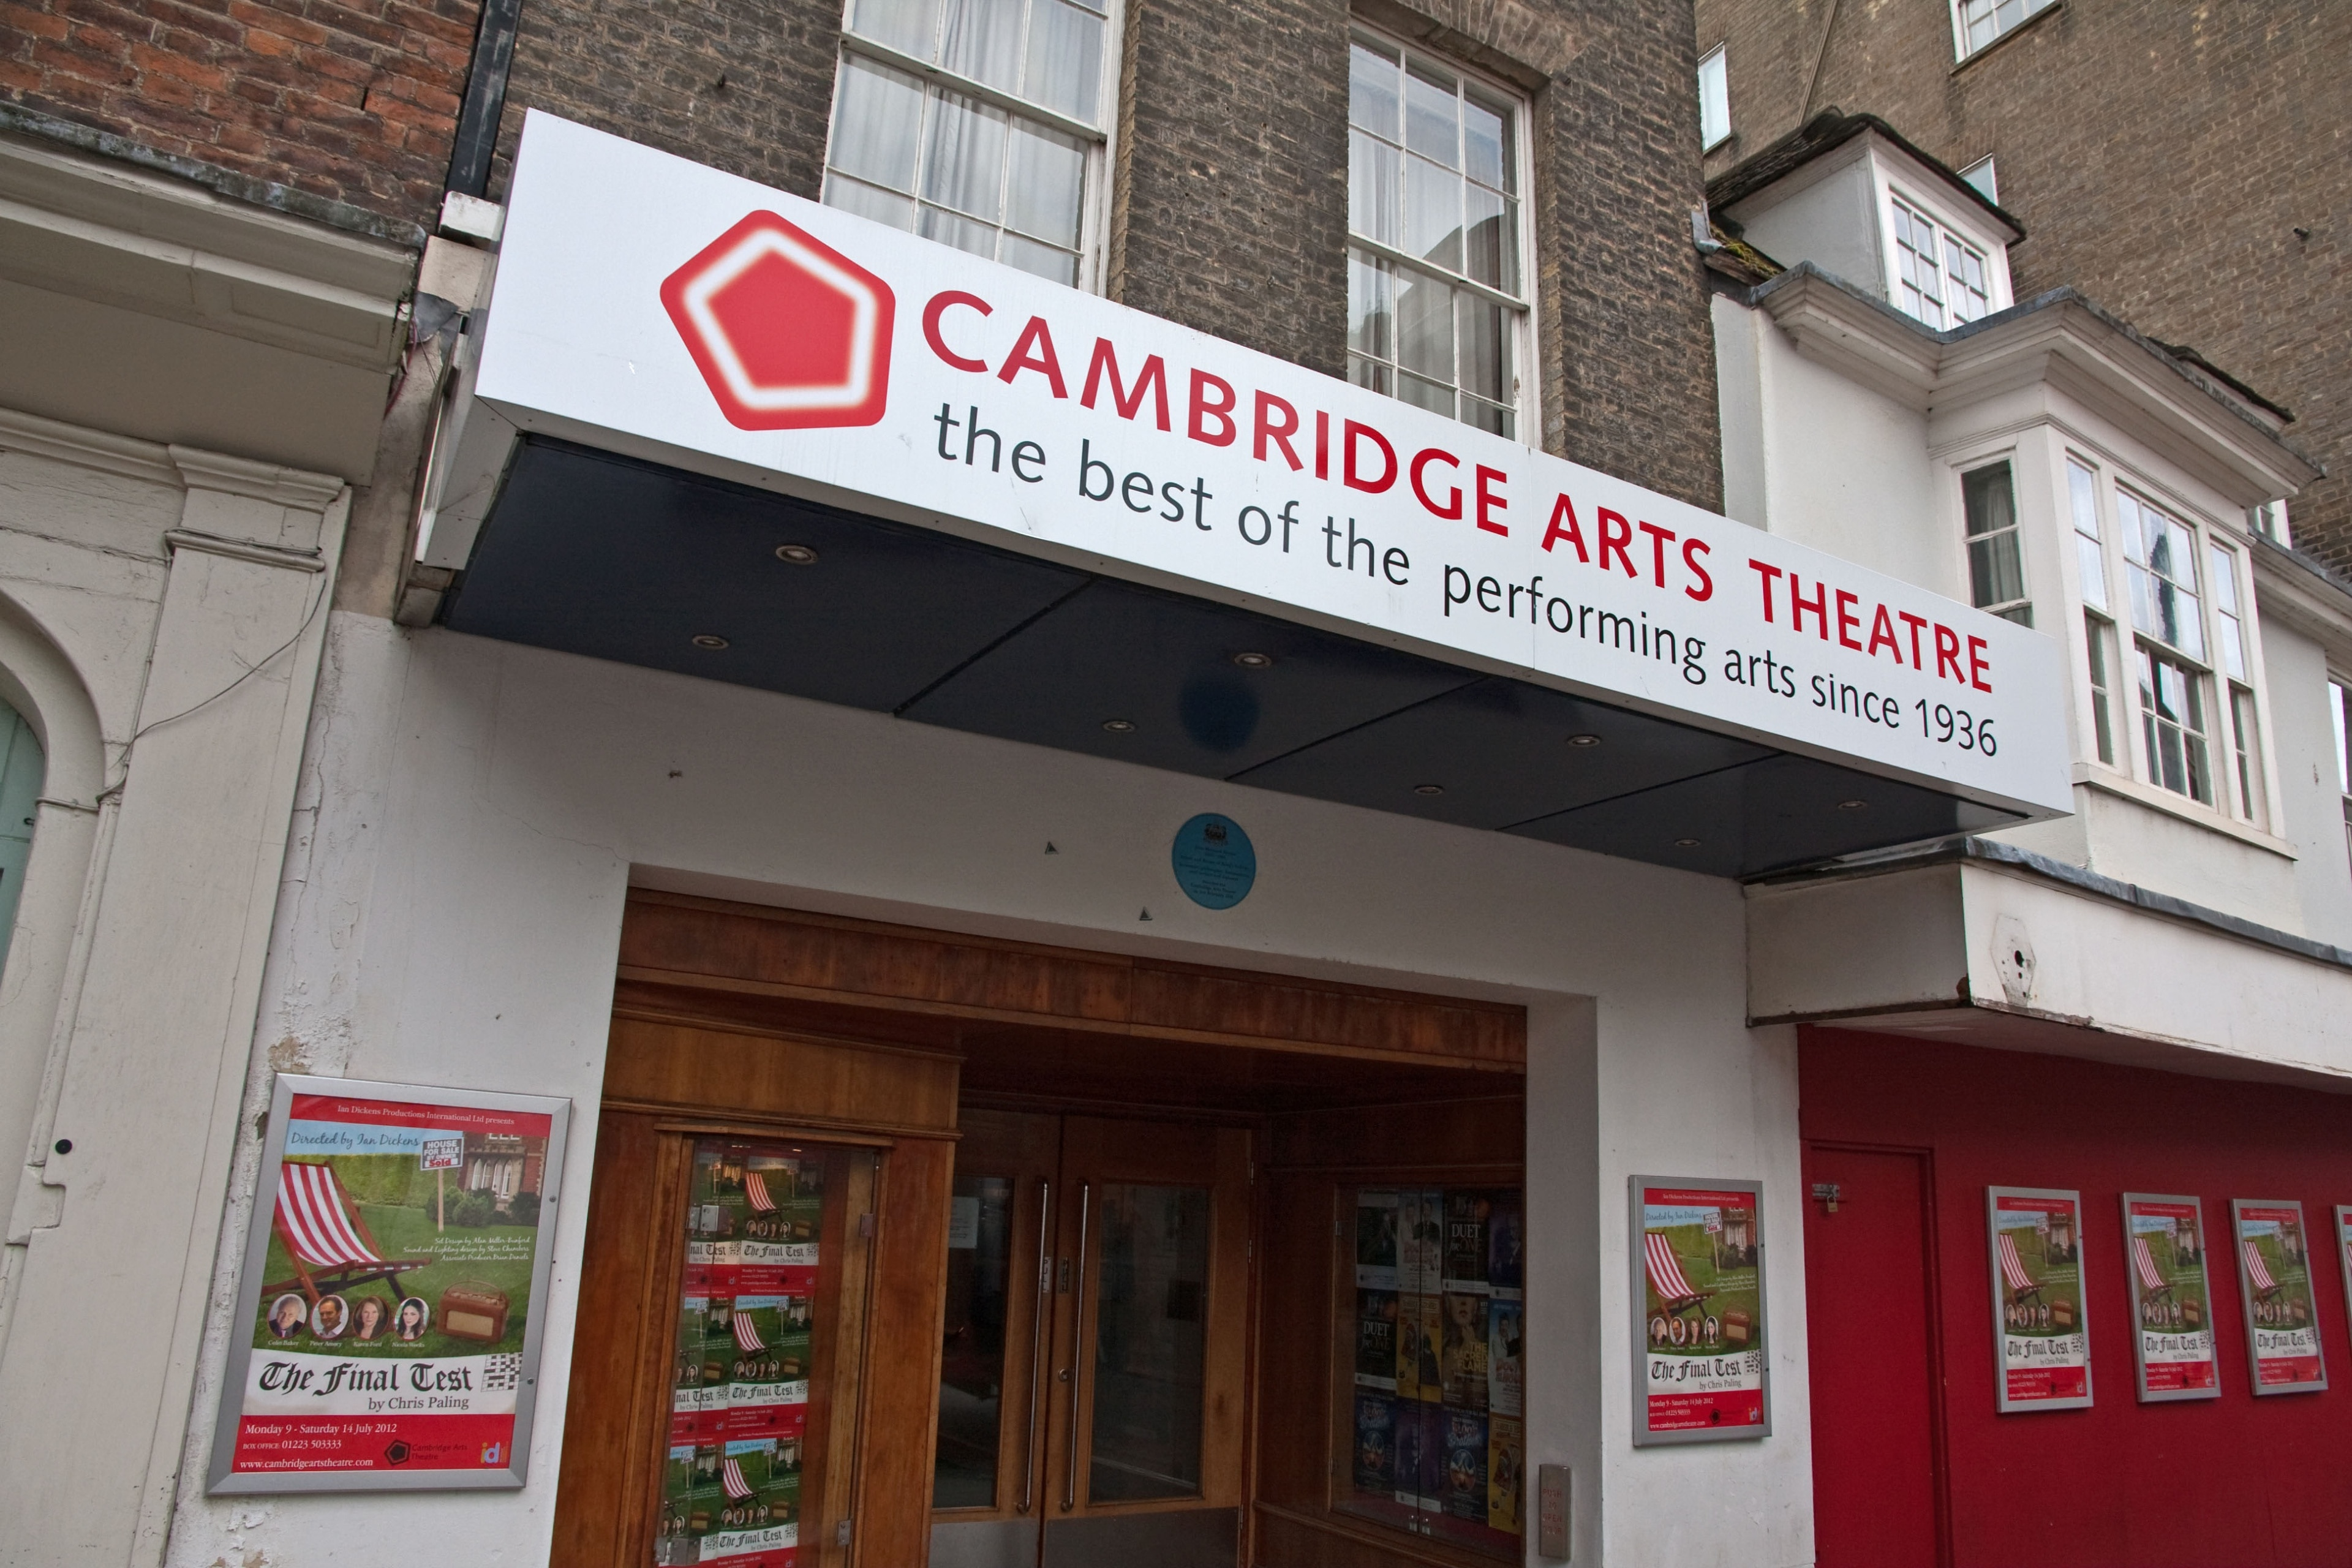 Cambridge Arts Theatre, Cambridge, Angleterre, Royaume-Uni